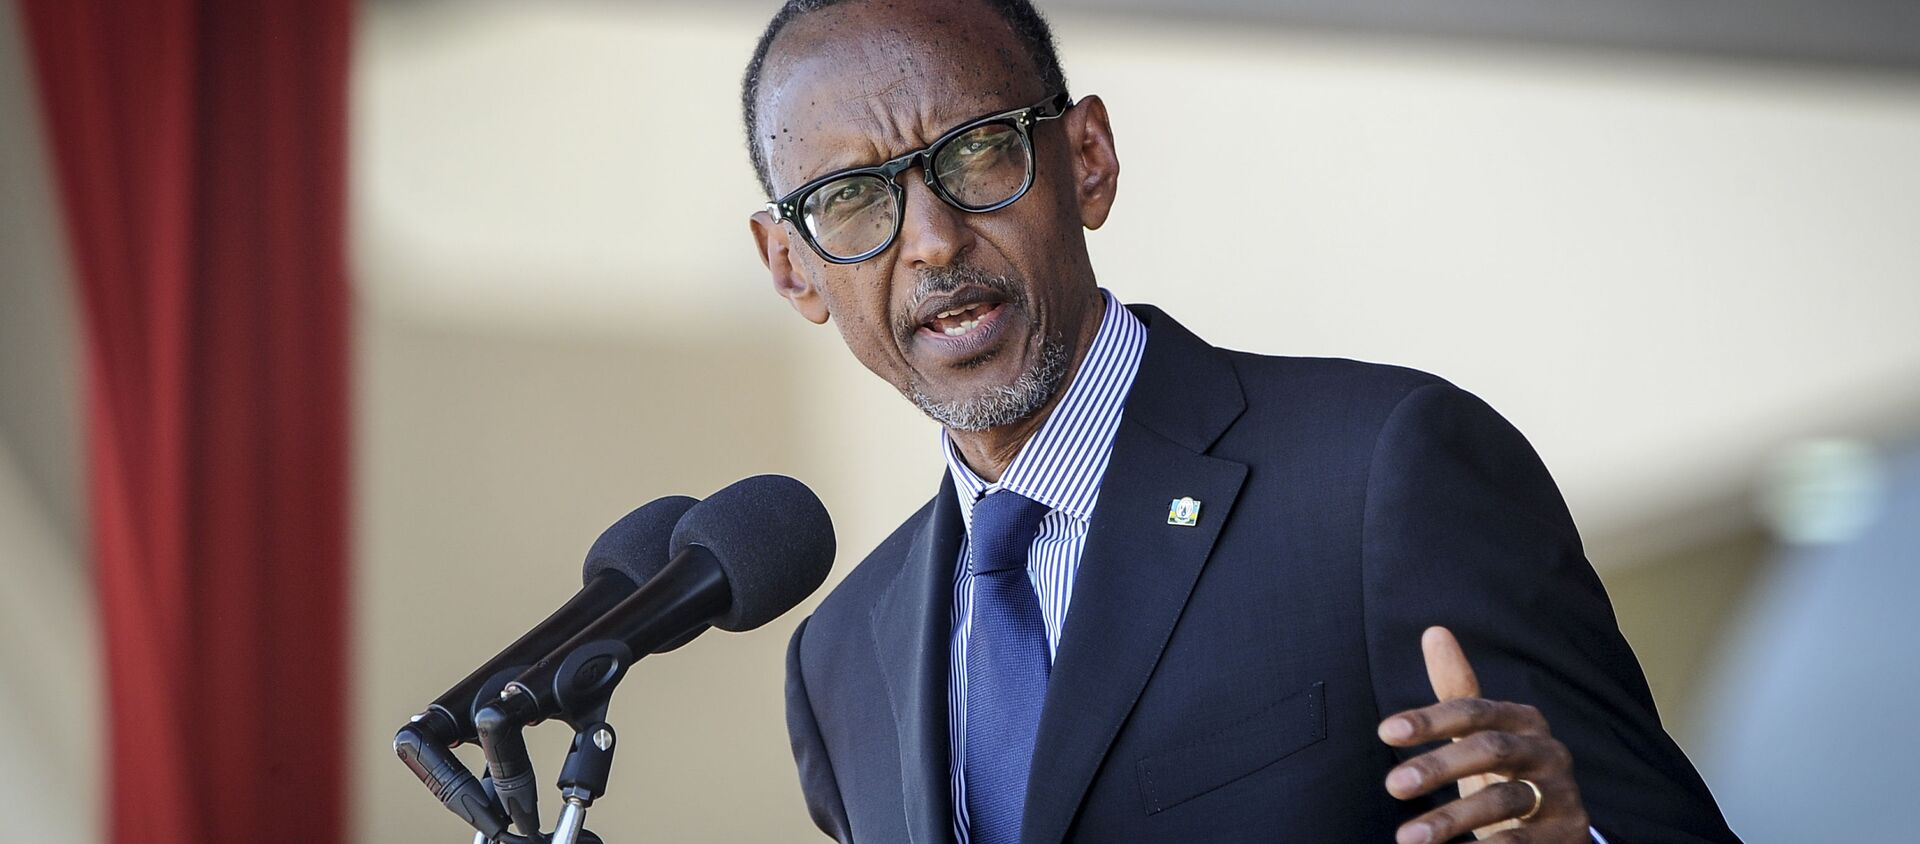 Paul Kagame, presdiente de Ruanda - Sputnik Mundo, 1920, 17.12.2020